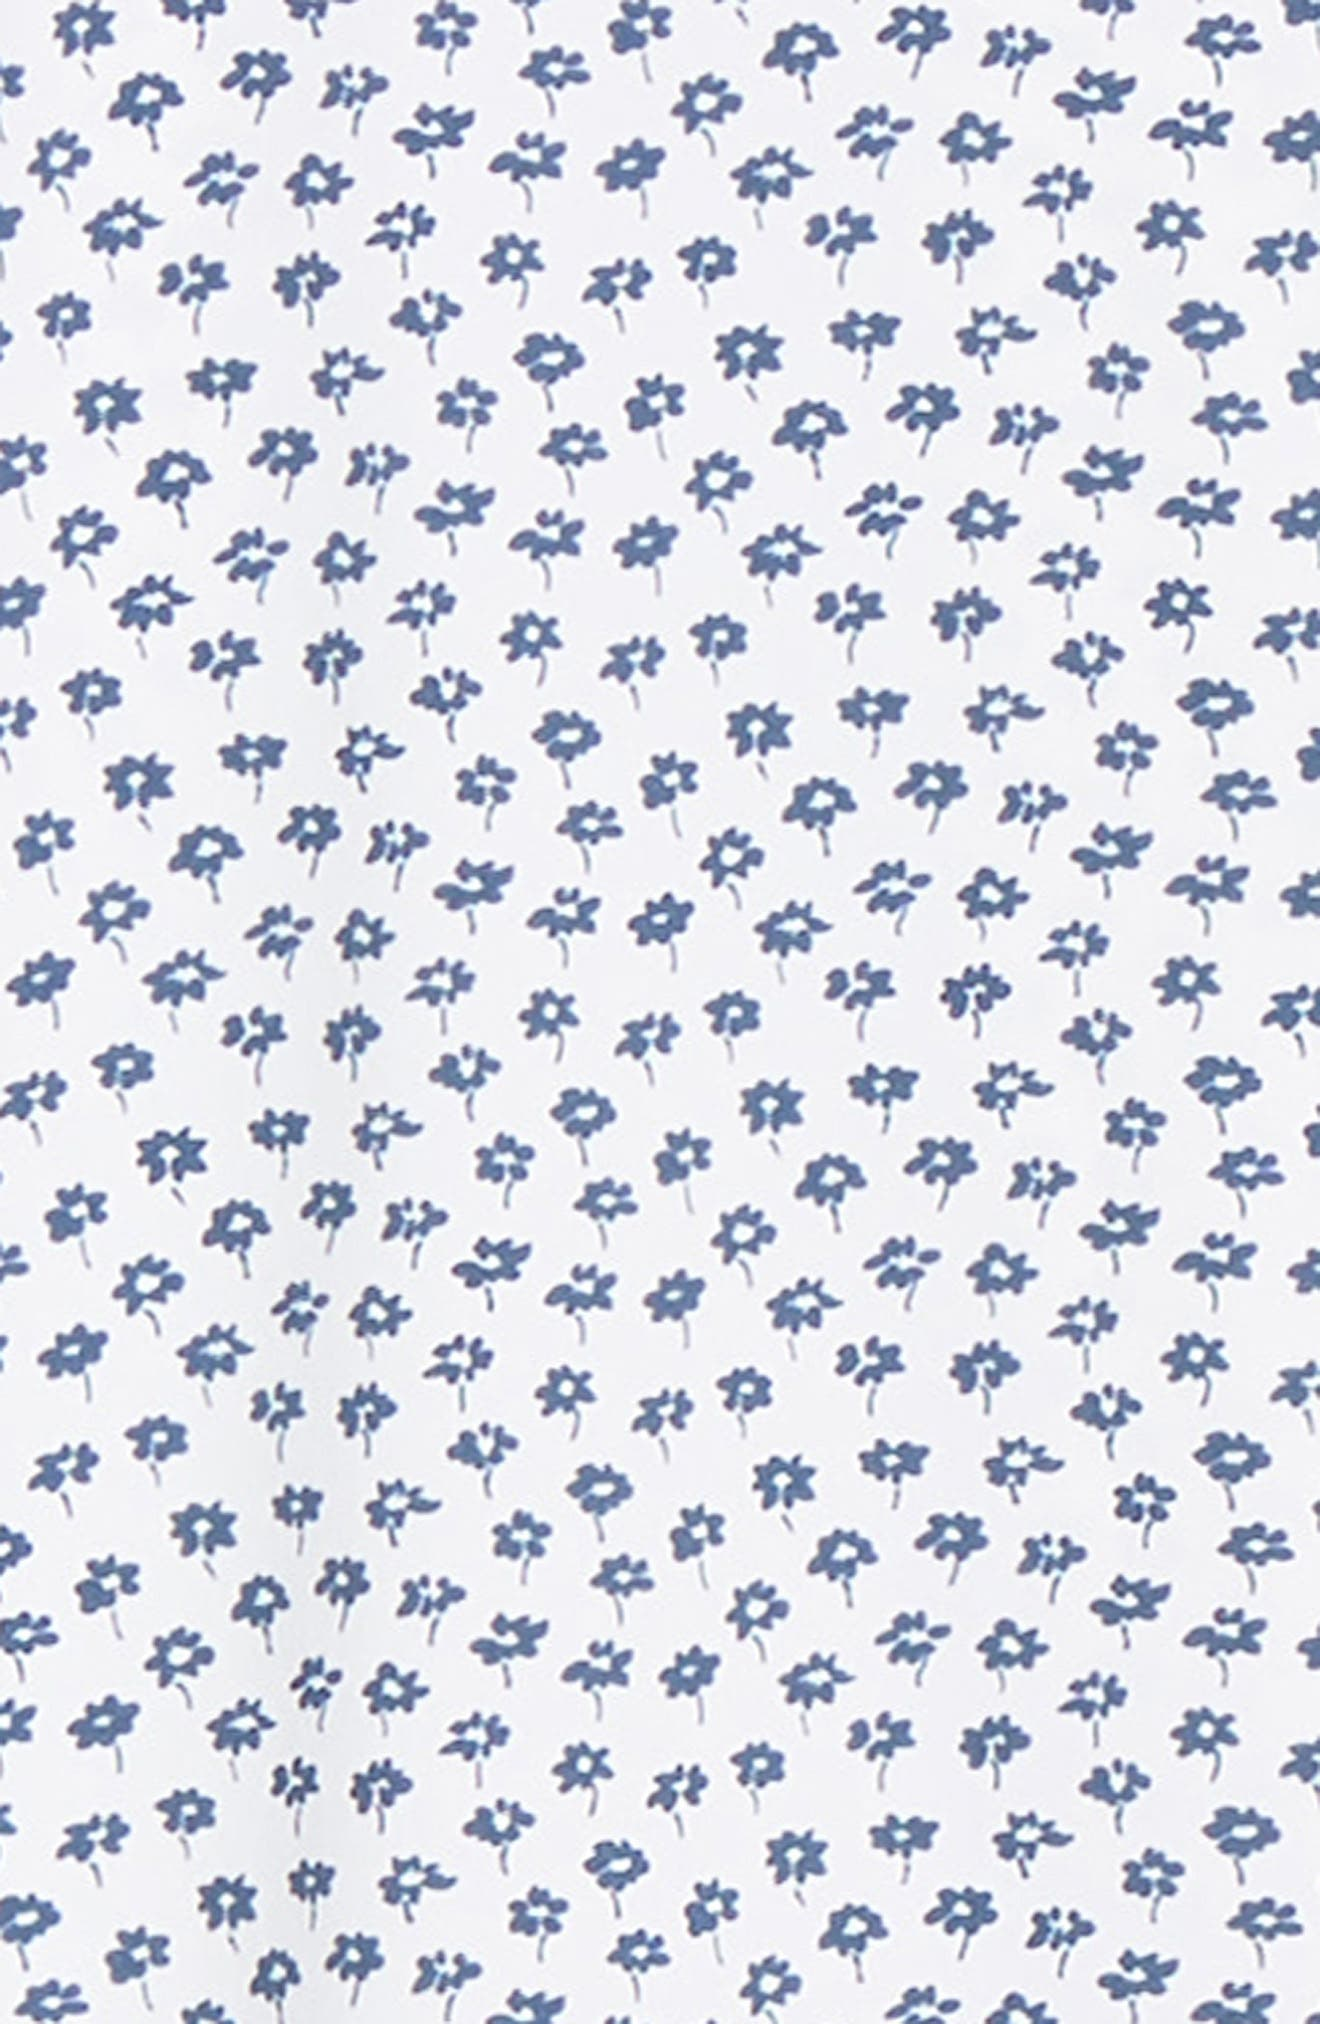 Slim Fit Floral Tech Sport Shirt,                             Alternate thumbnail 6, color,                             FLORAL STAMP - PEACOCK